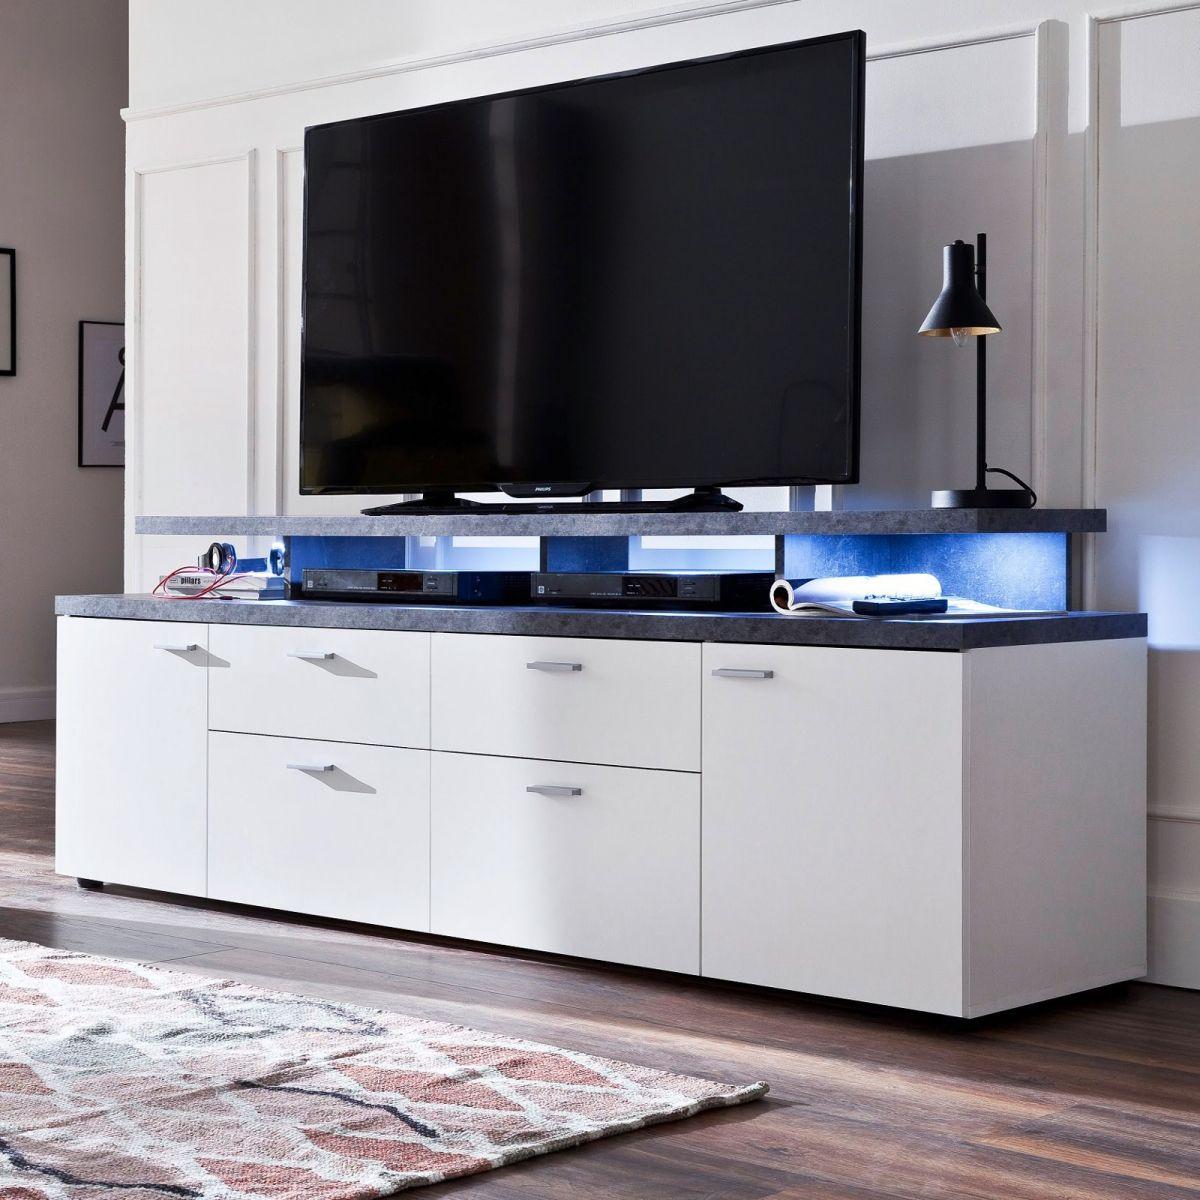 TV-Lowboard weiss und Stone grau 180 cm Komforthöhe